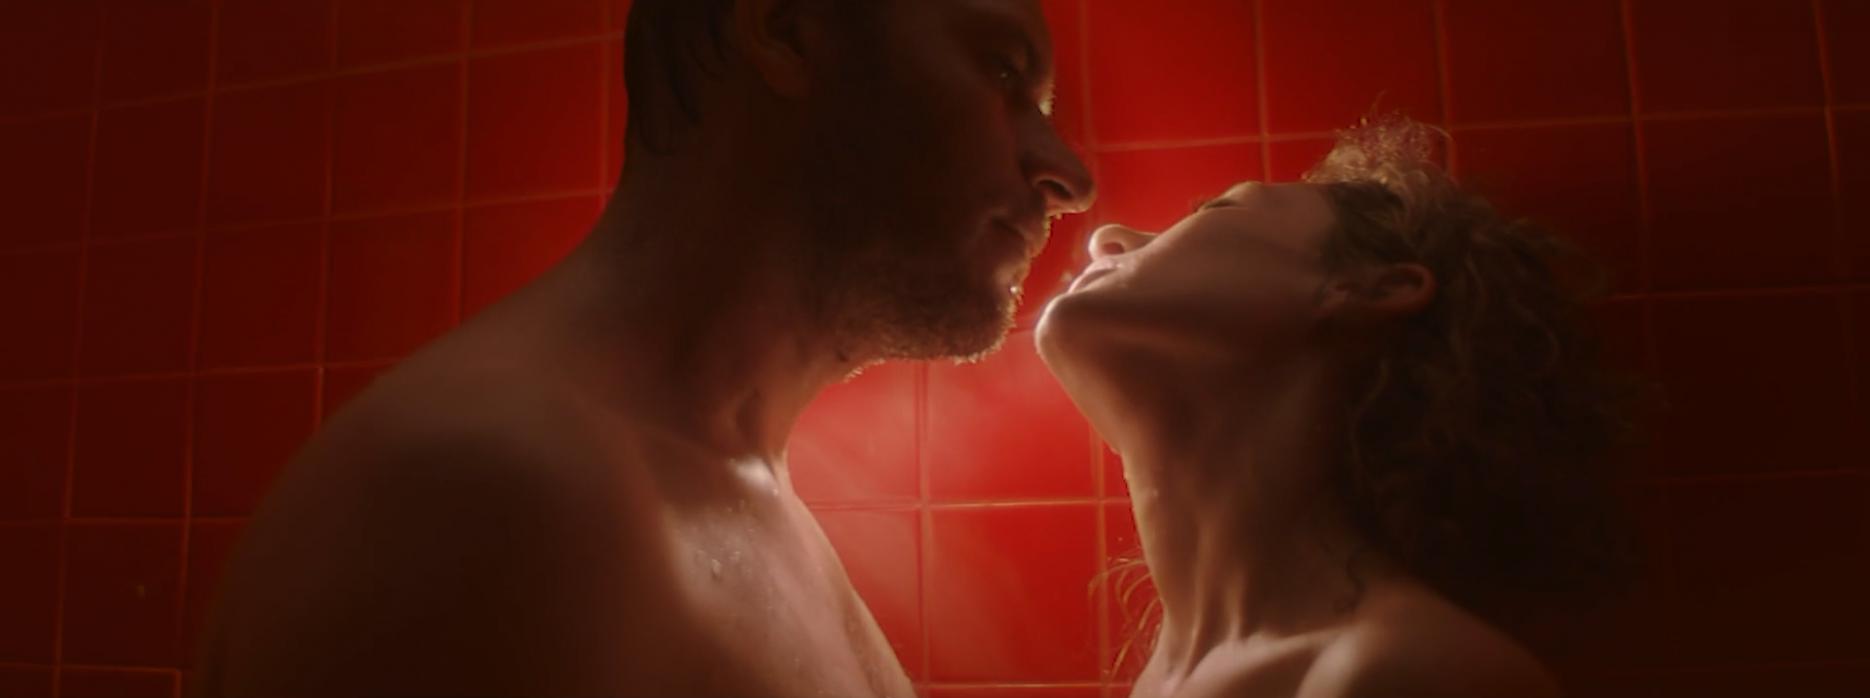 Him & Her - An Anti-Valentine Love Story by Daria Geller for KEYI Magazine Berlin / Fashion Culture Magazine